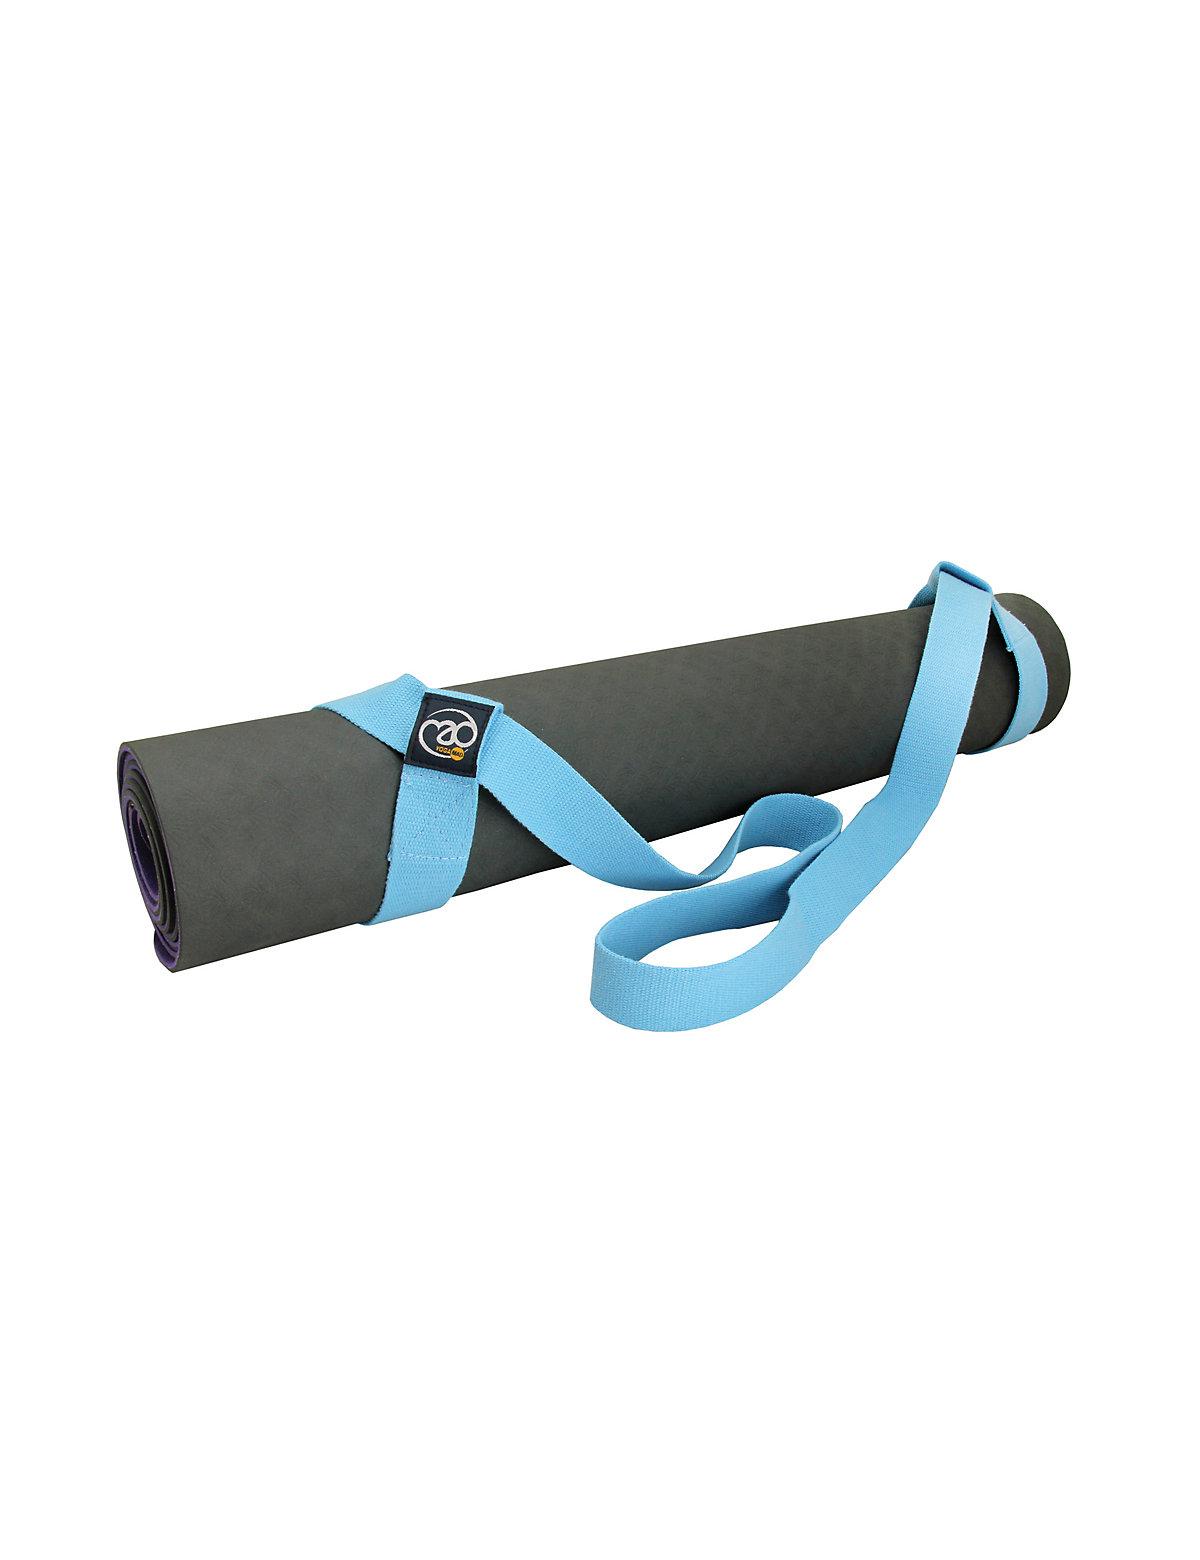 Yoga-Mad Yoga Mat Carry Strap